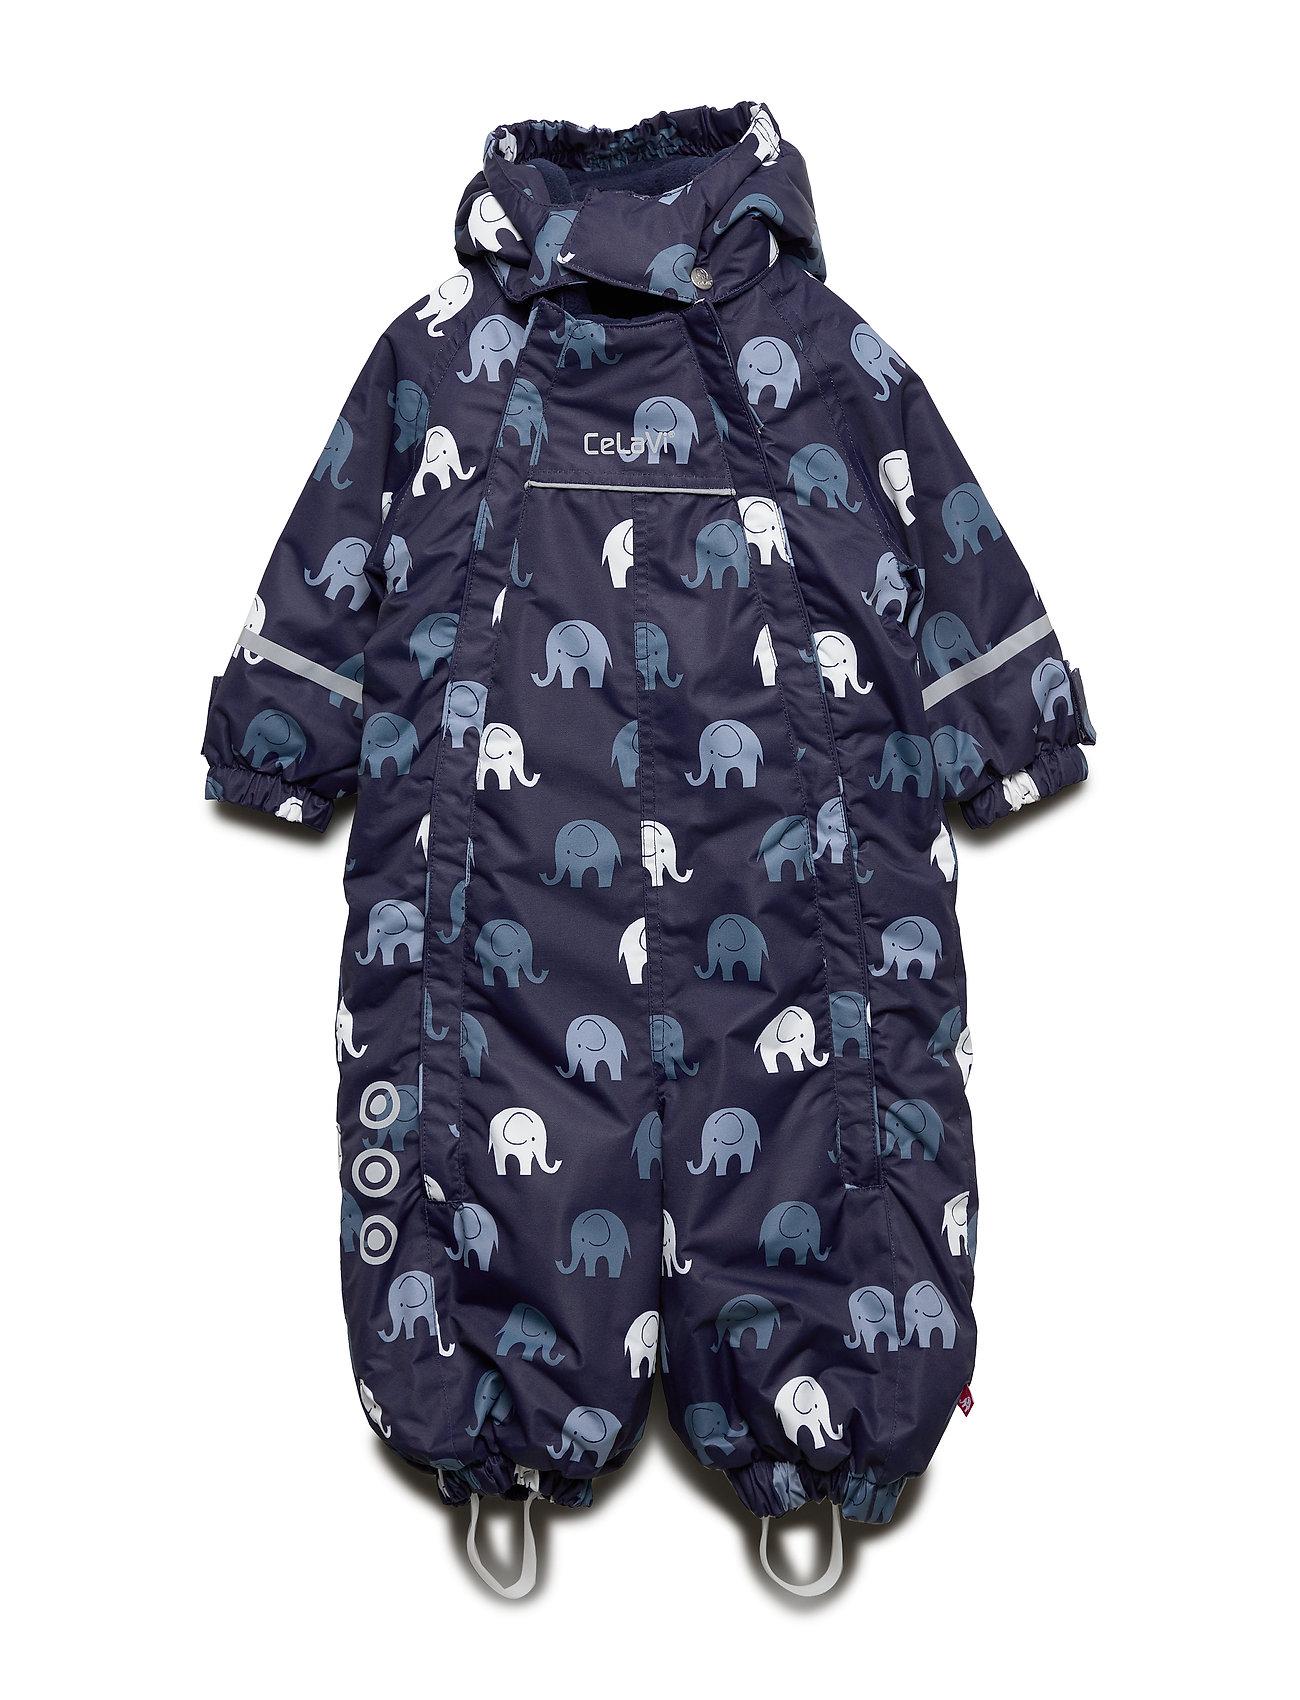 CeLaVi Snowsuit -elephant w 2 zippers - NAVY